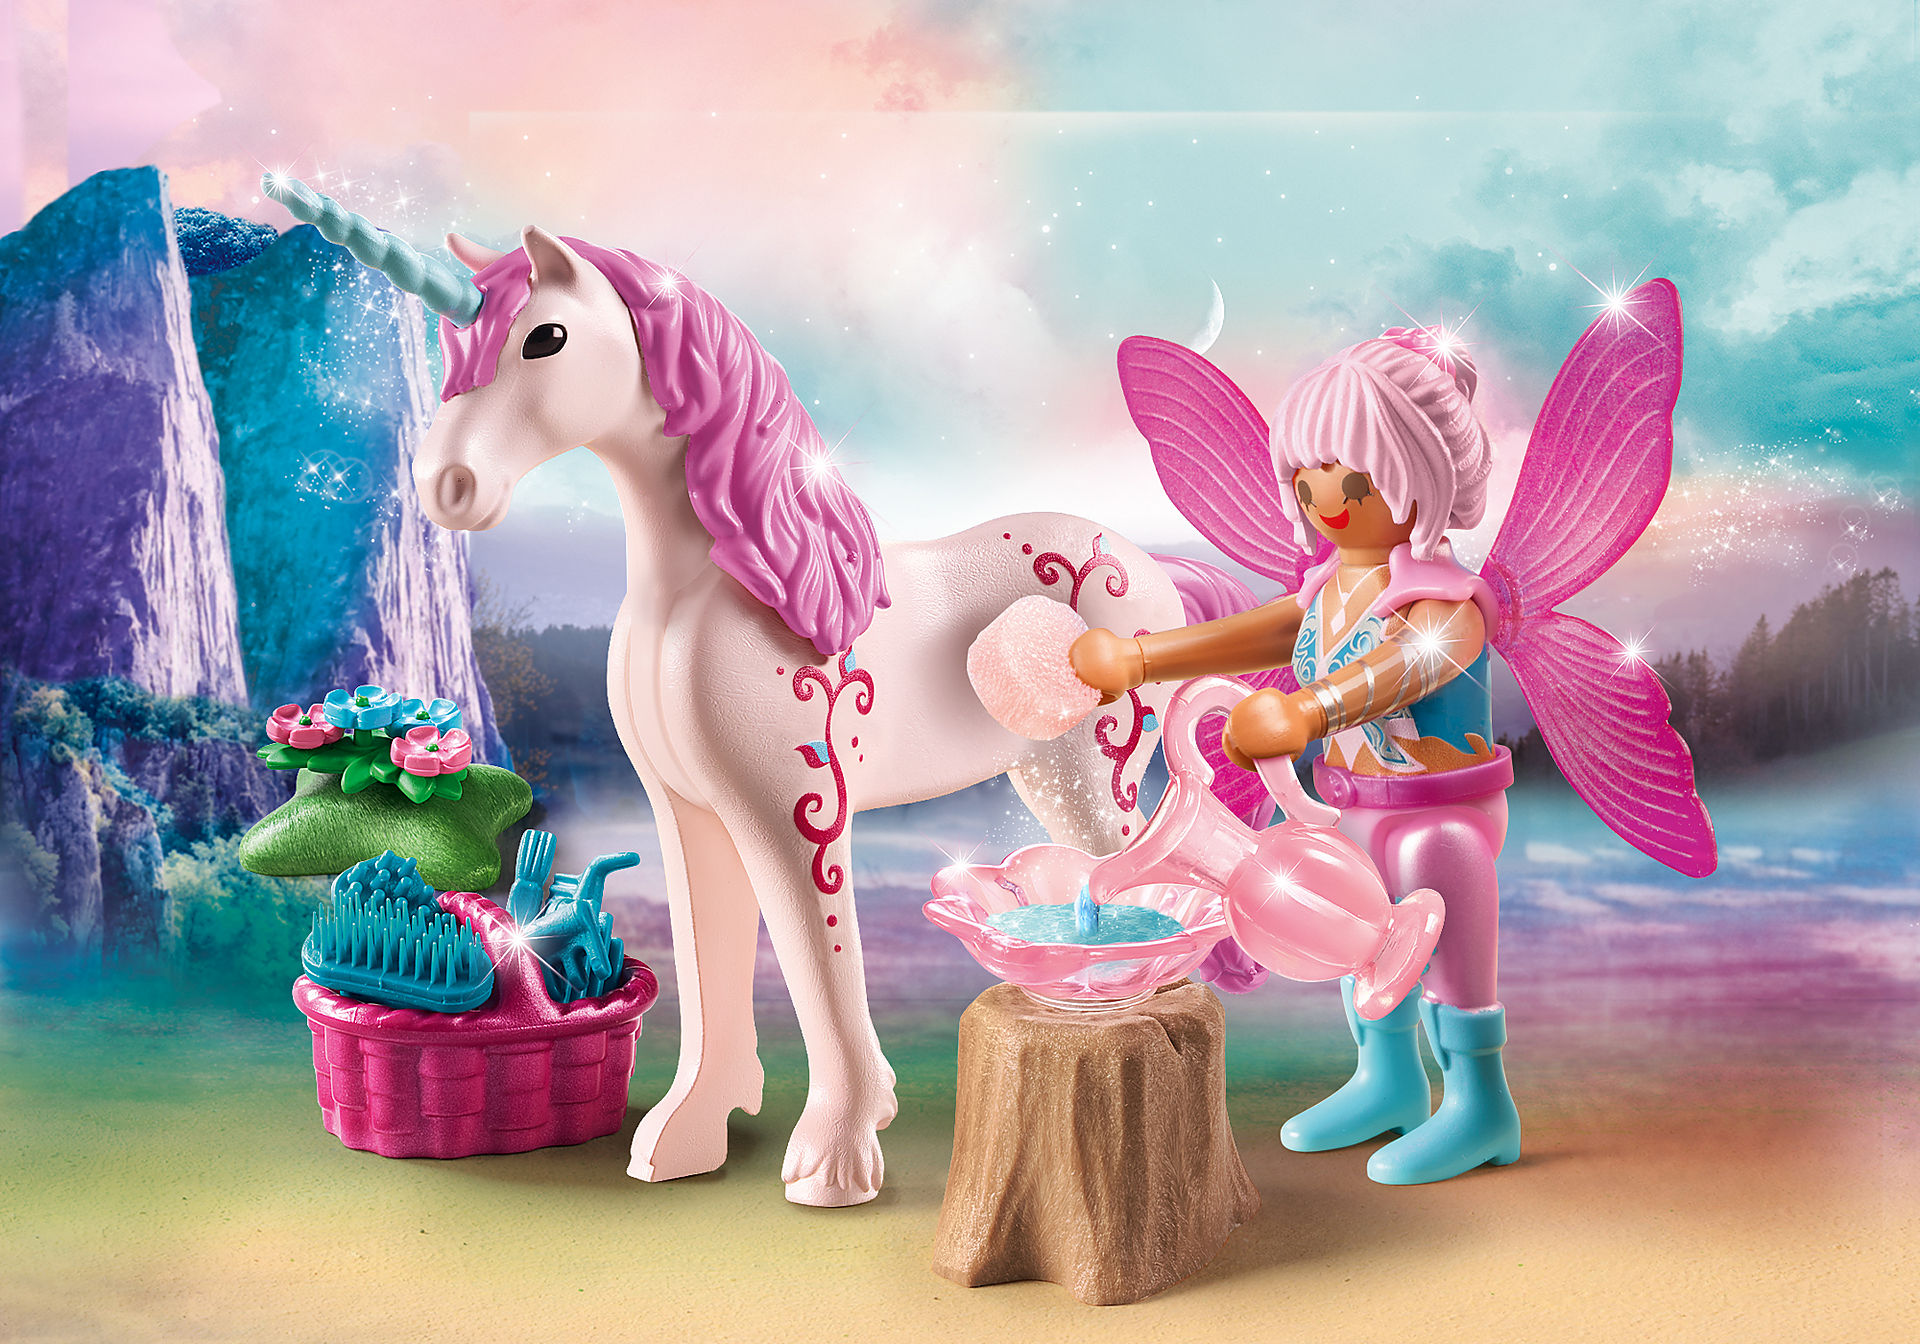 70658 Caretaker Fairy with Unicorn zoom image1